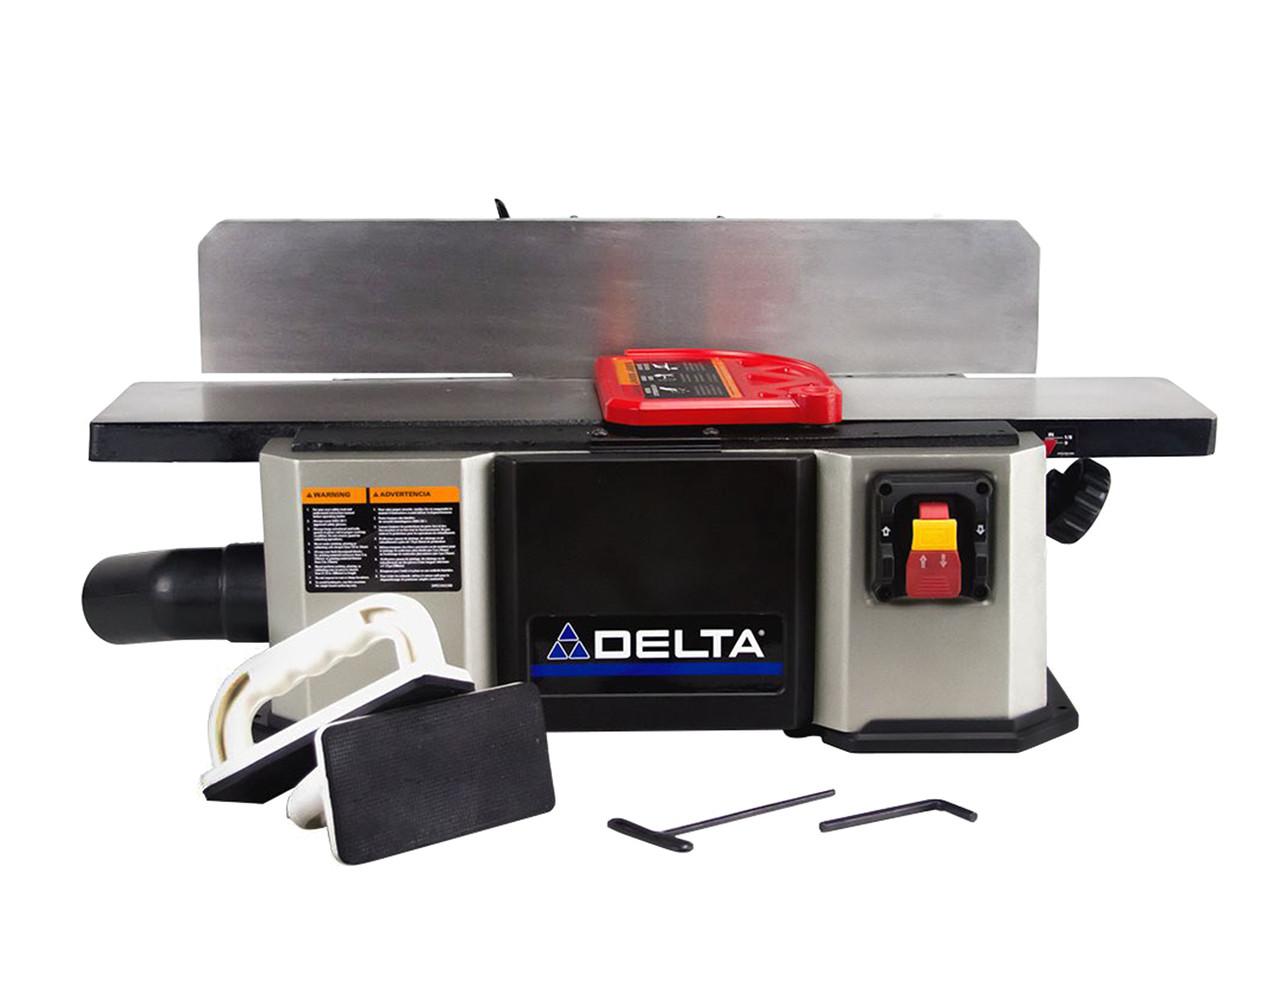 Delta 8 Inch Jointer